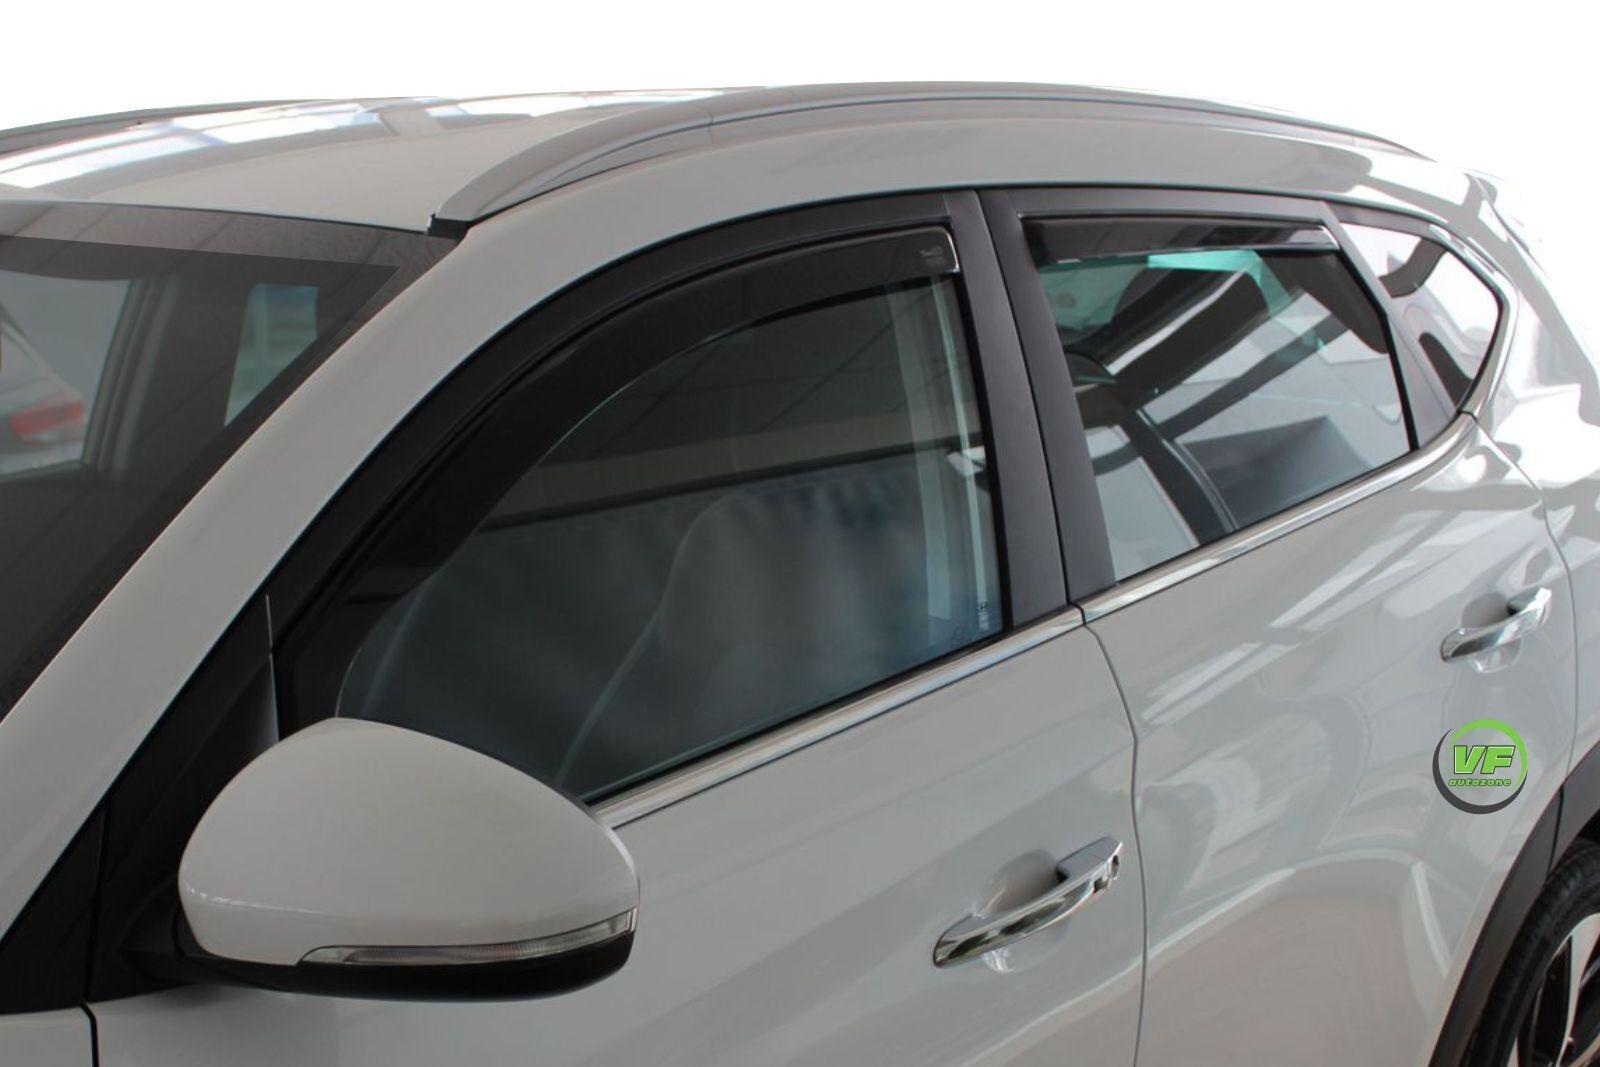 Dhy17285 Hyundai Tucson Mk2 2015 Up Wind Deflectors 4pc